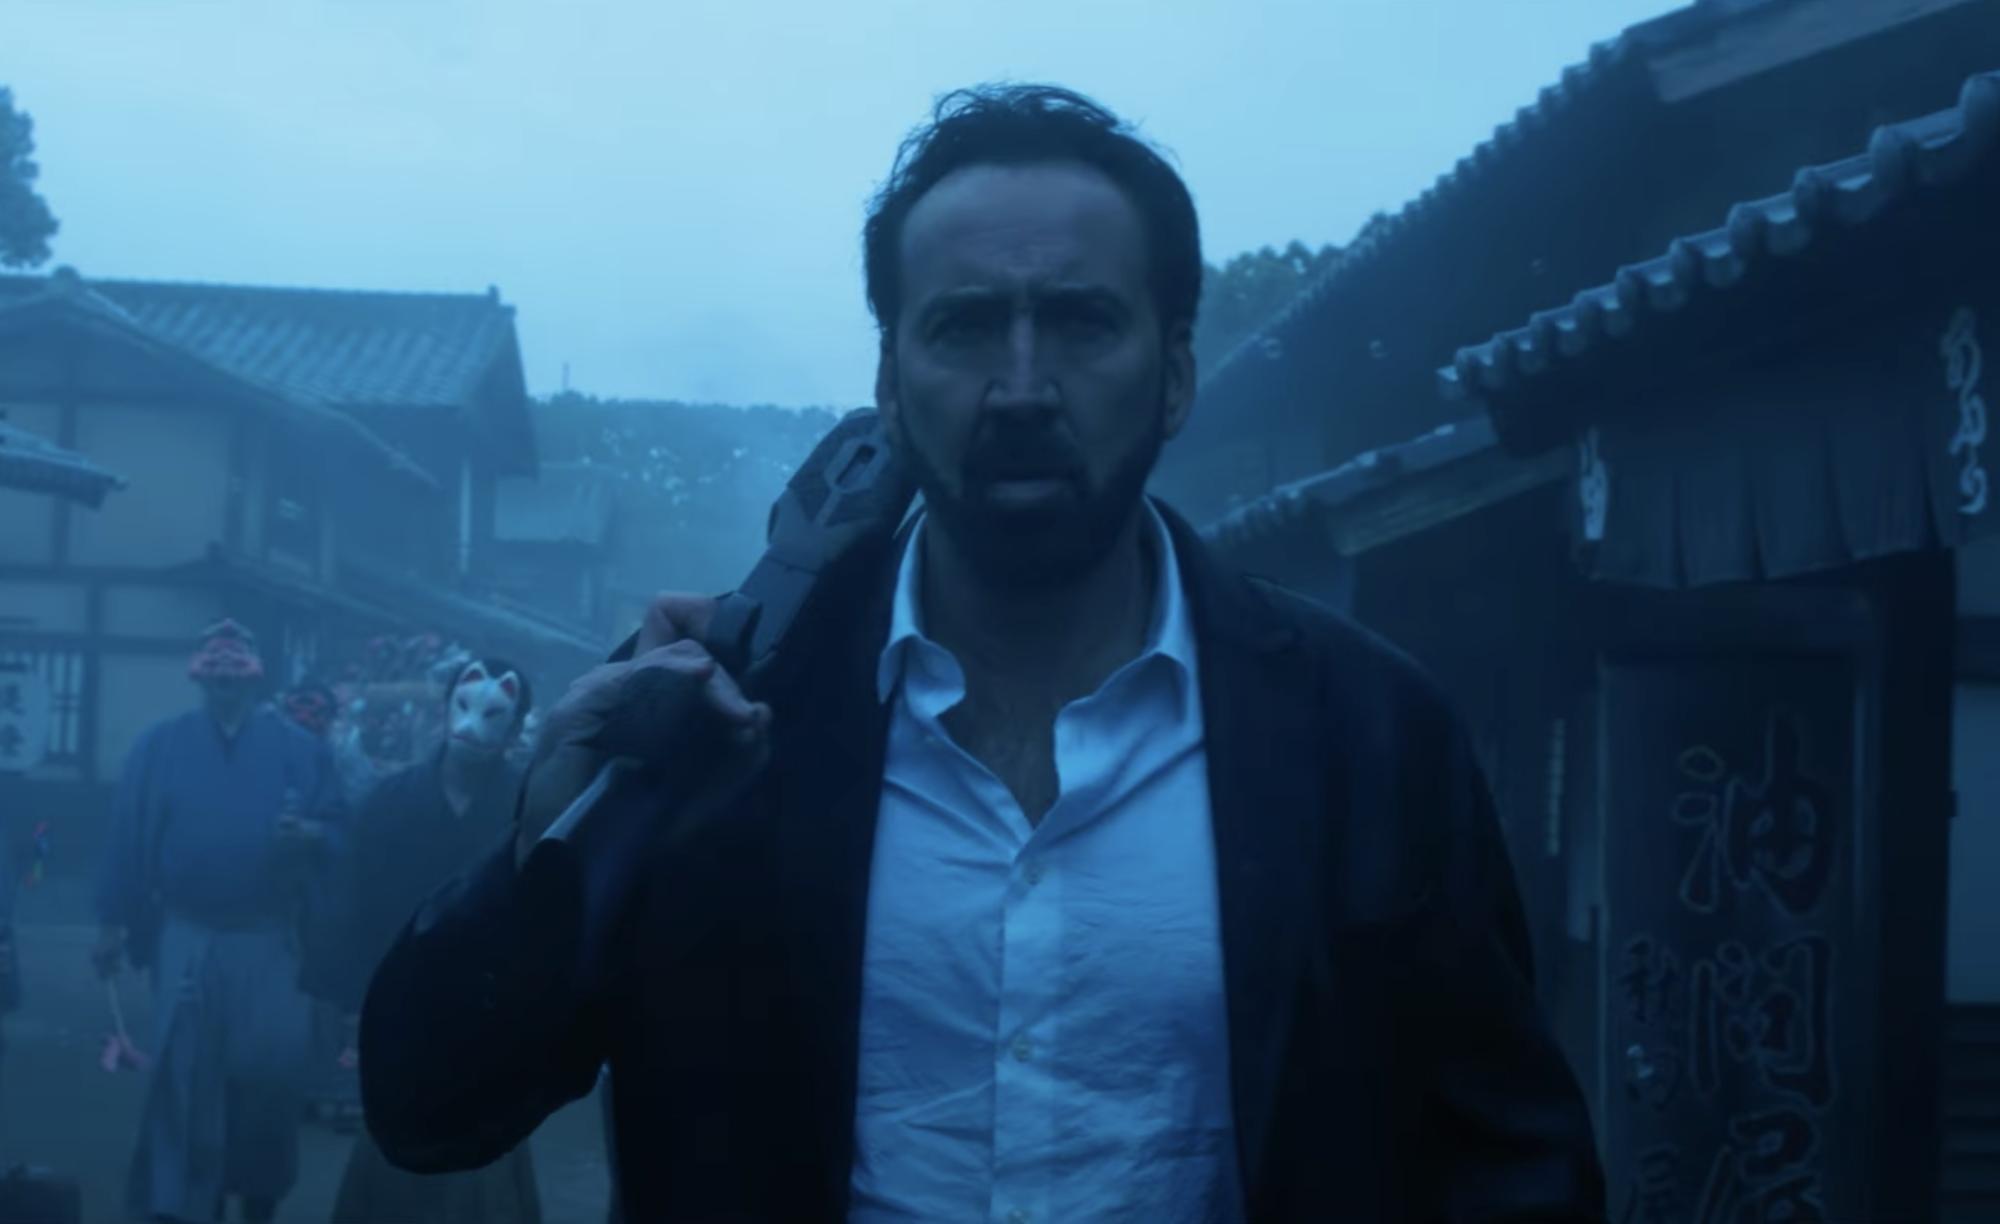 Nicolas Cage Teams with Sion Sono For a Bonkers Samurai Western